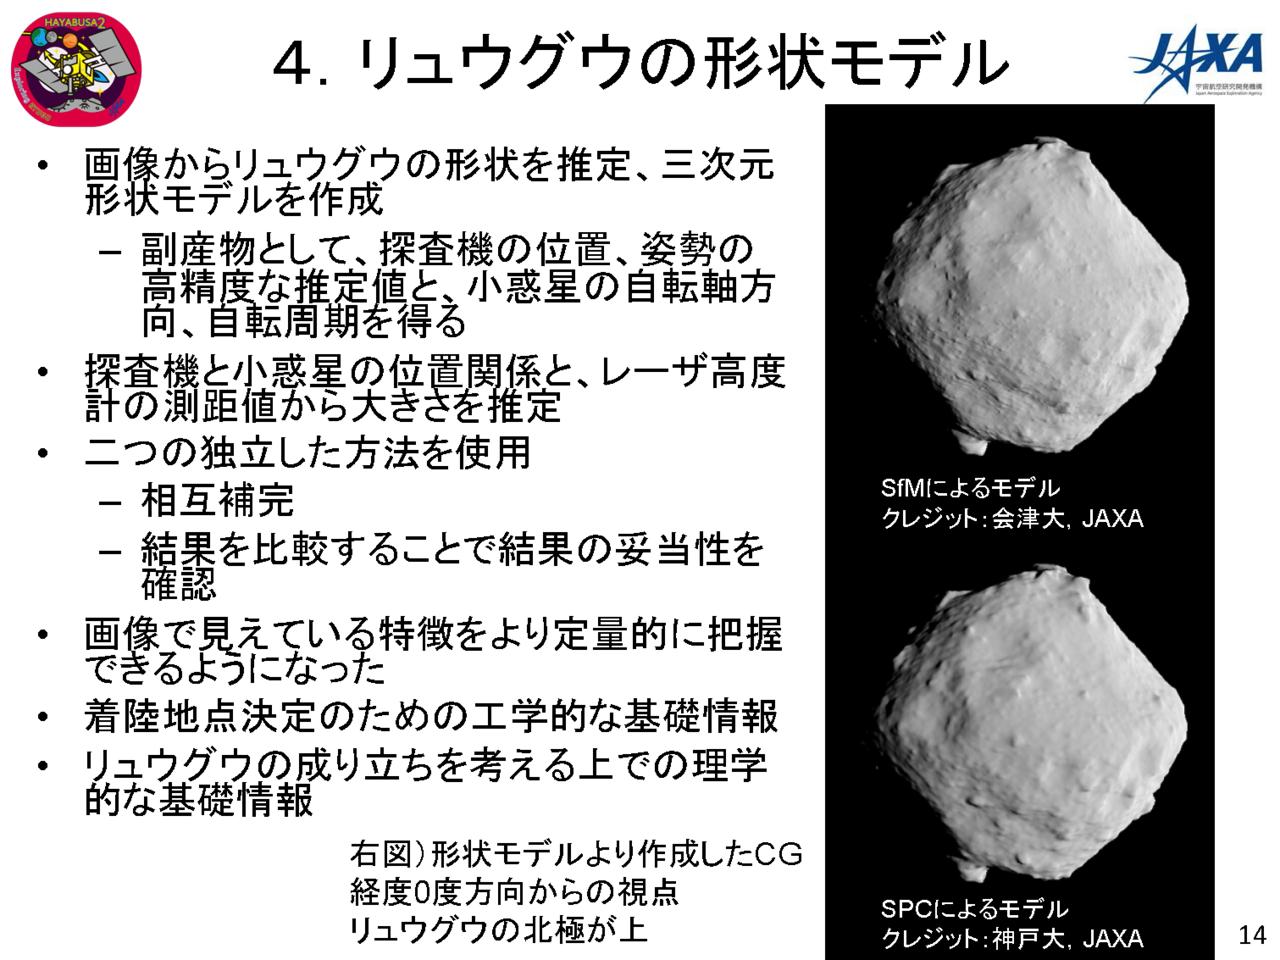 f:id:Imamura:20180802145934p:plain